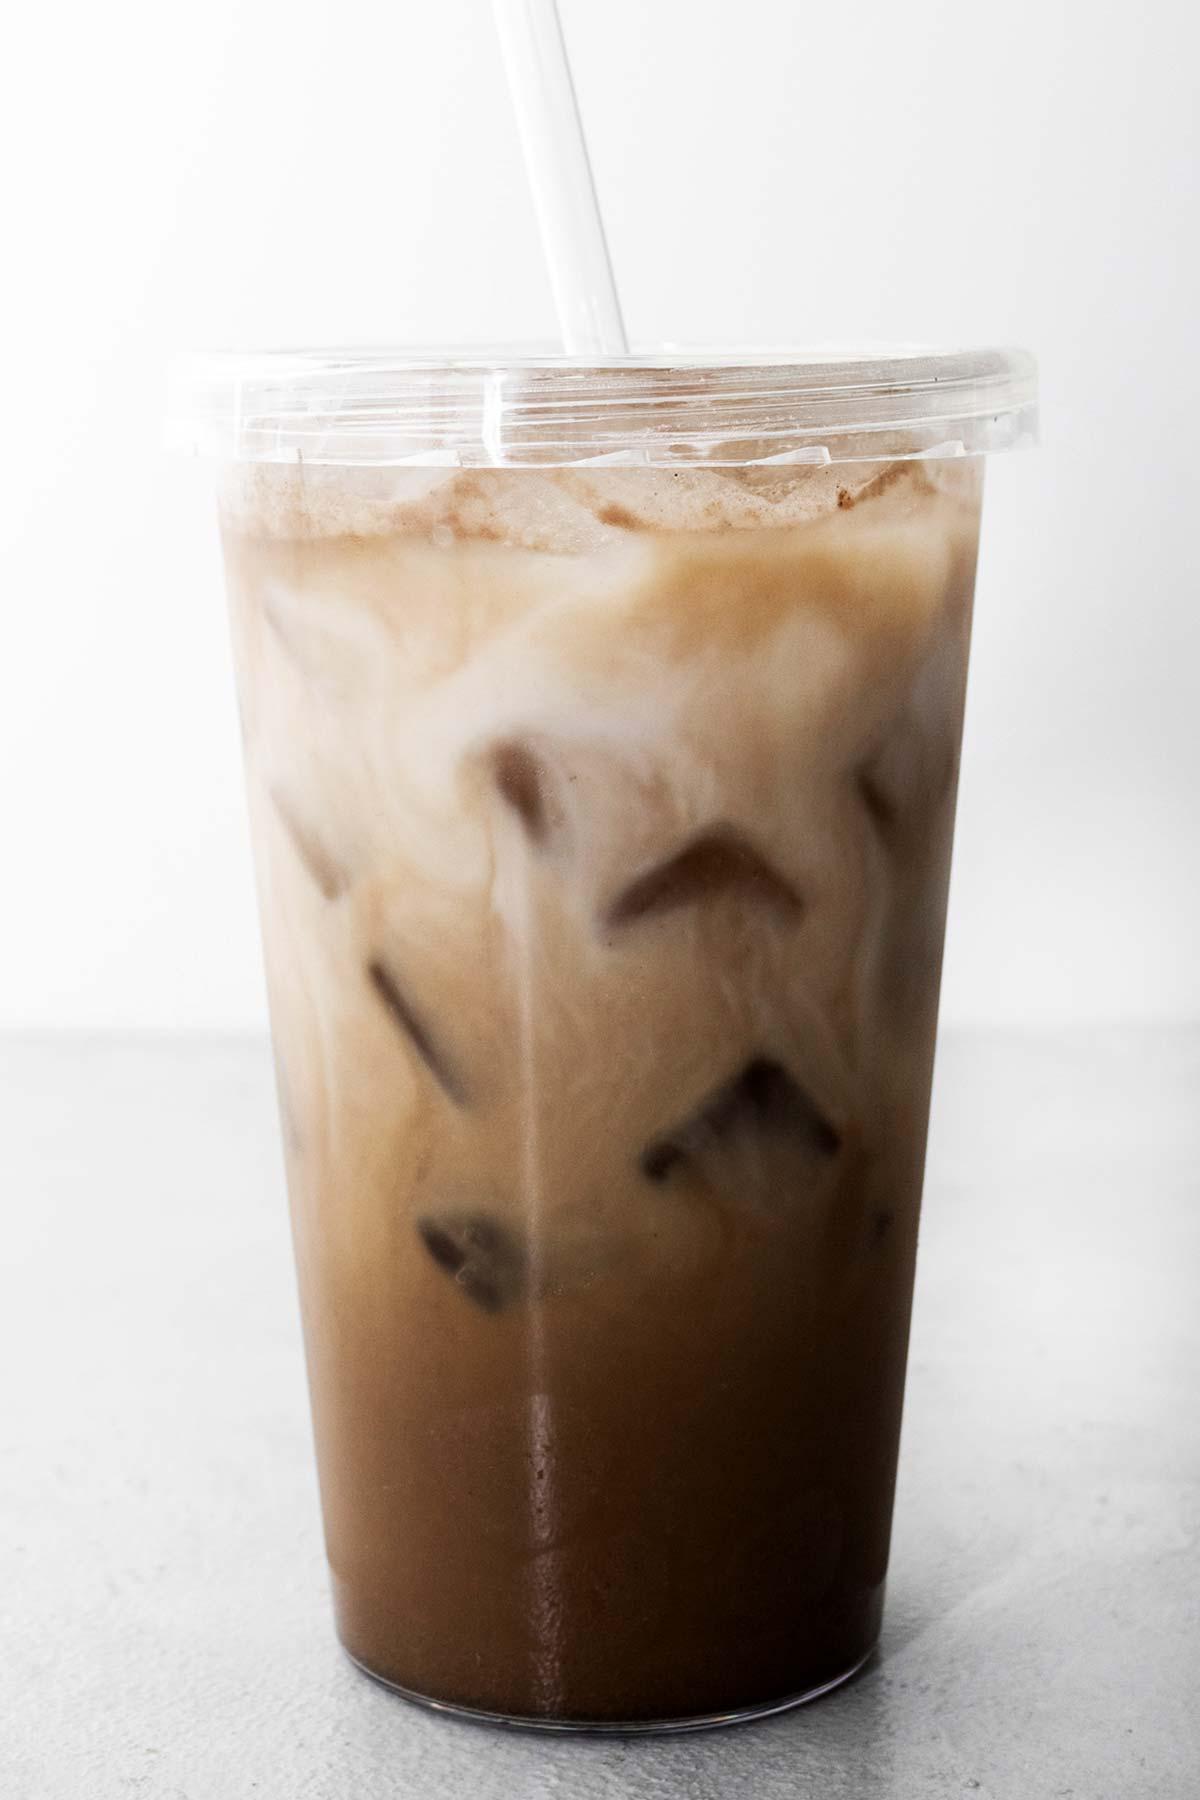 Starbucks Iced Chocolate Almondmilk Shaken Espresso Copycat drink in a cup with a straw.